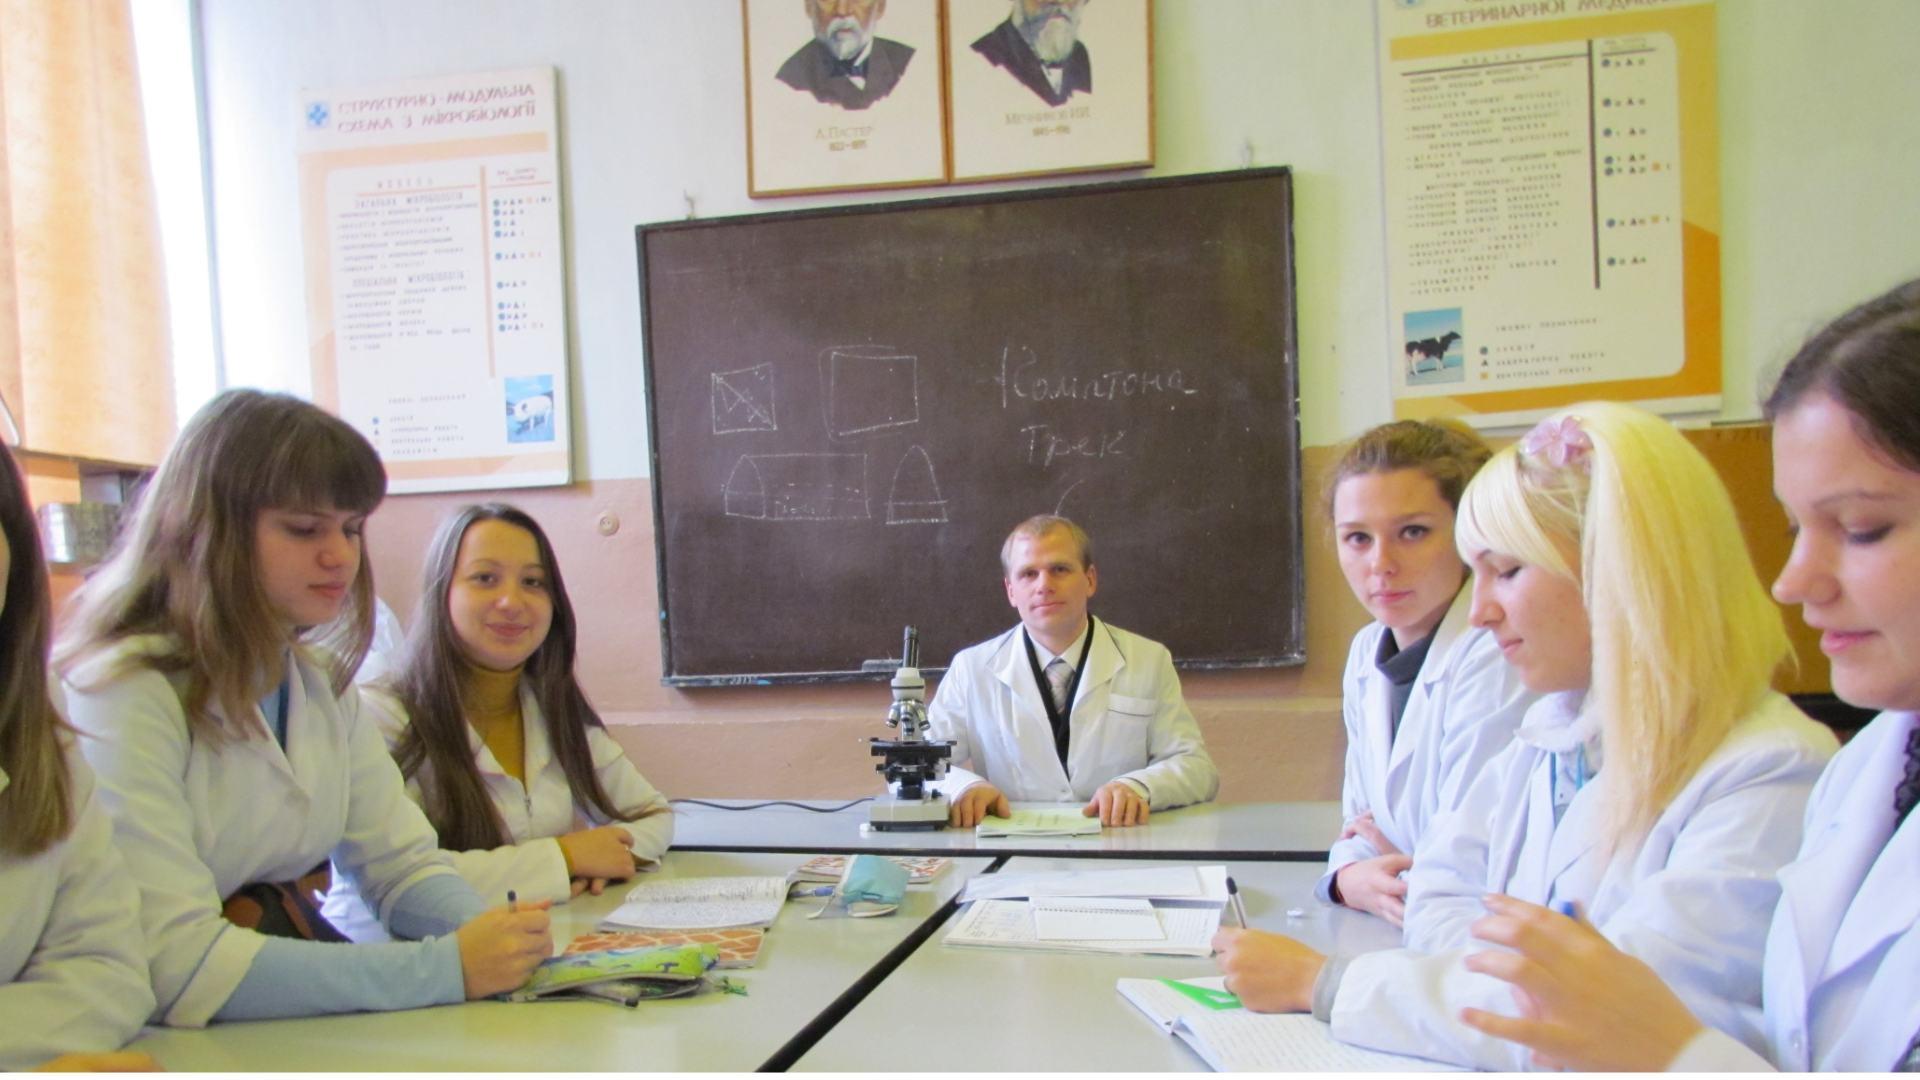 Професорсько-викладацький склад кафедри